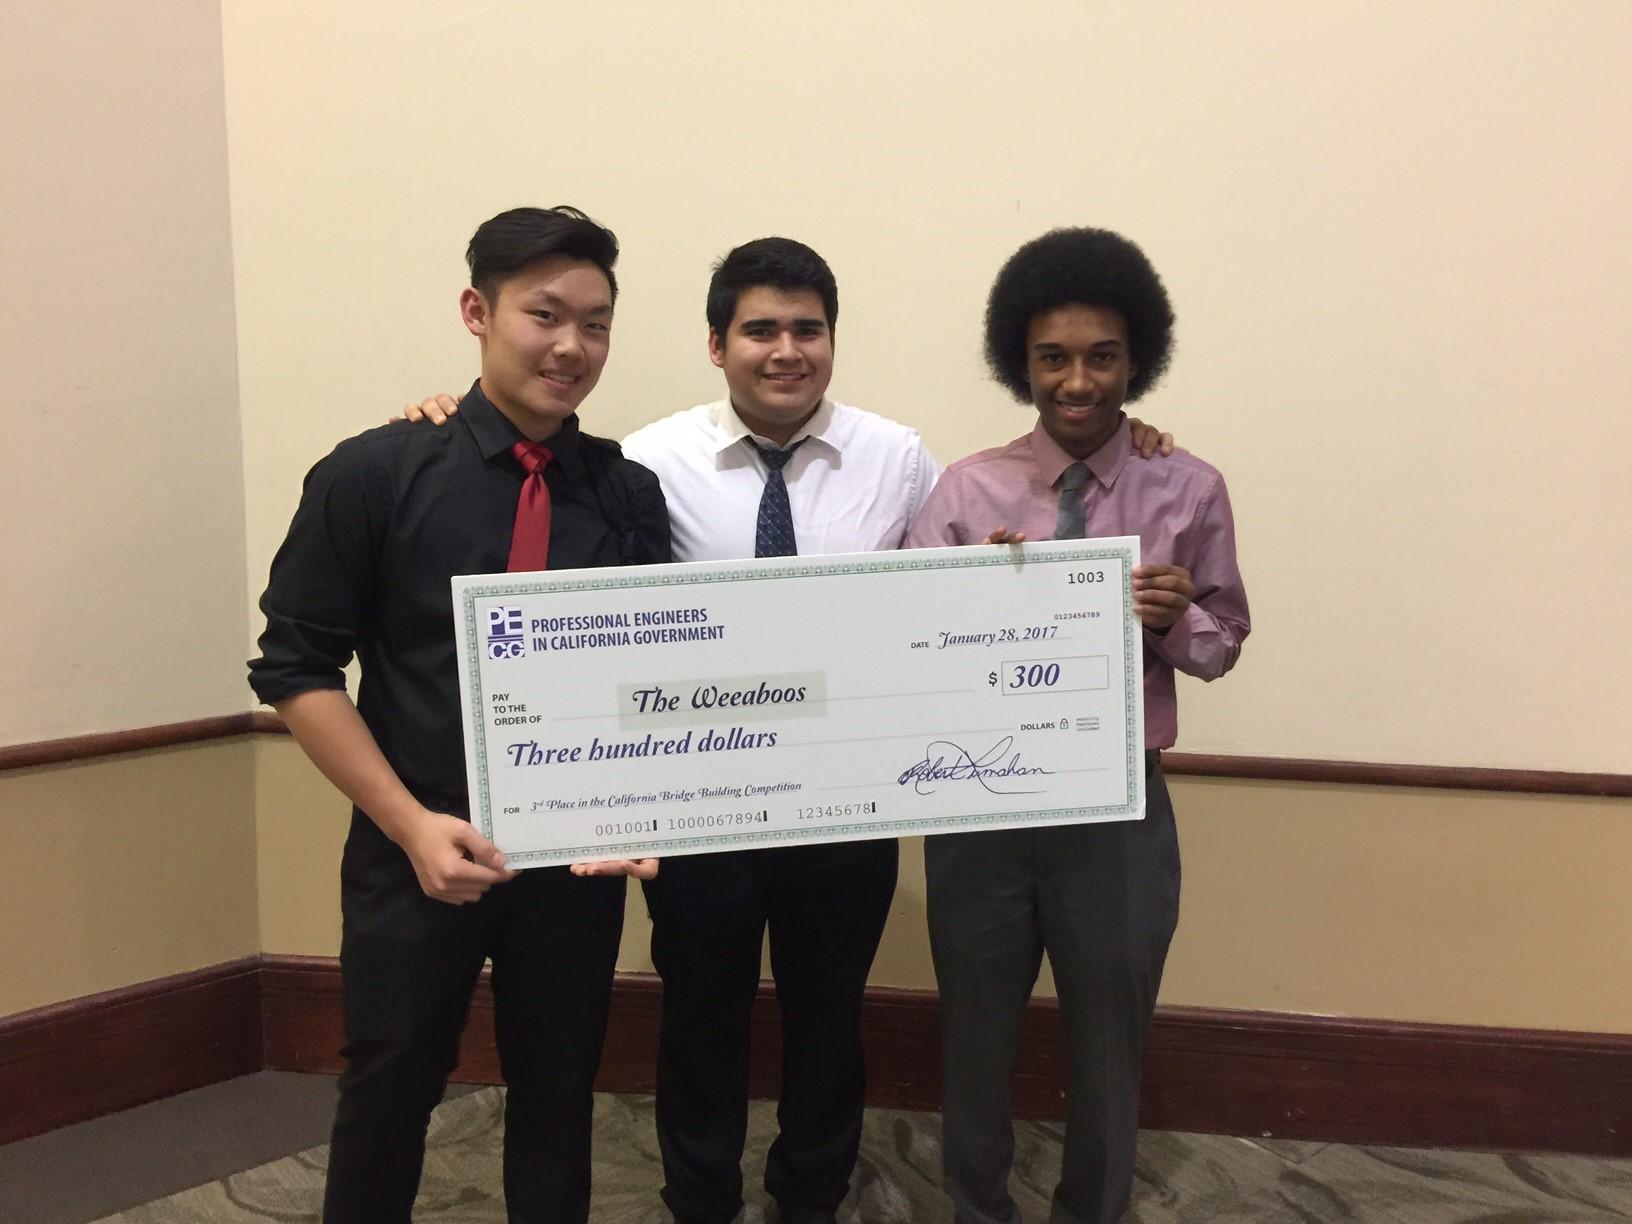 Third Place - Samson Nguyen, James Chairez, Osiris Brown